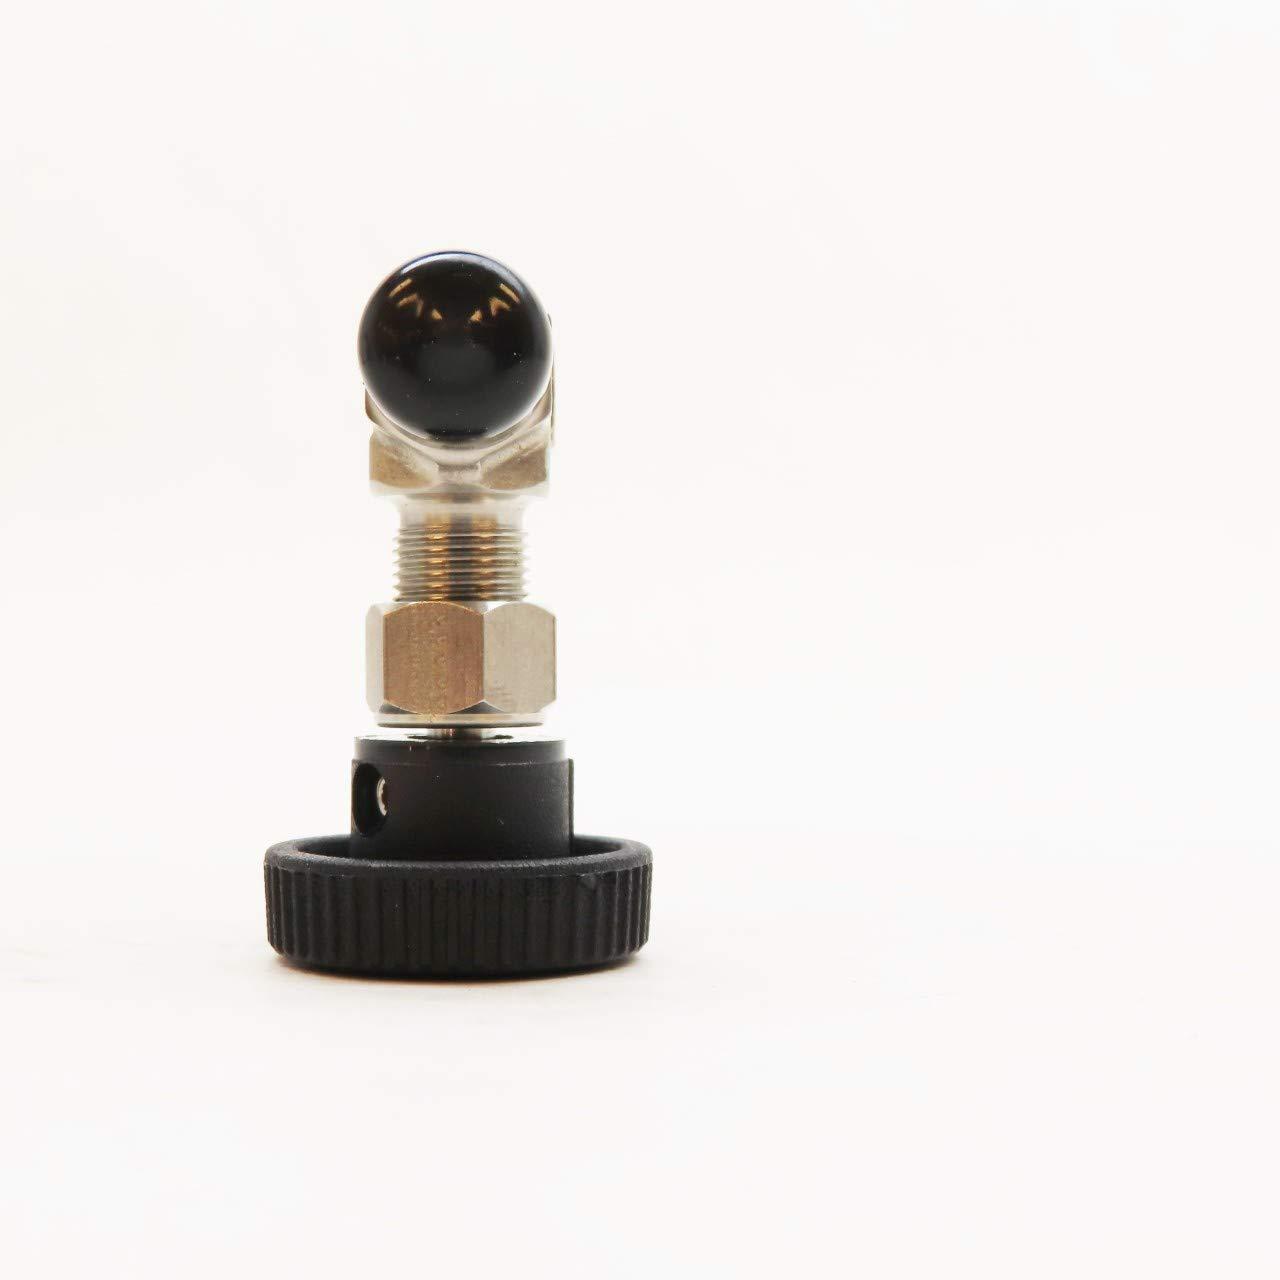 Tru-Arc Type SR 300-375 3-3//4 Internal Snap Ring